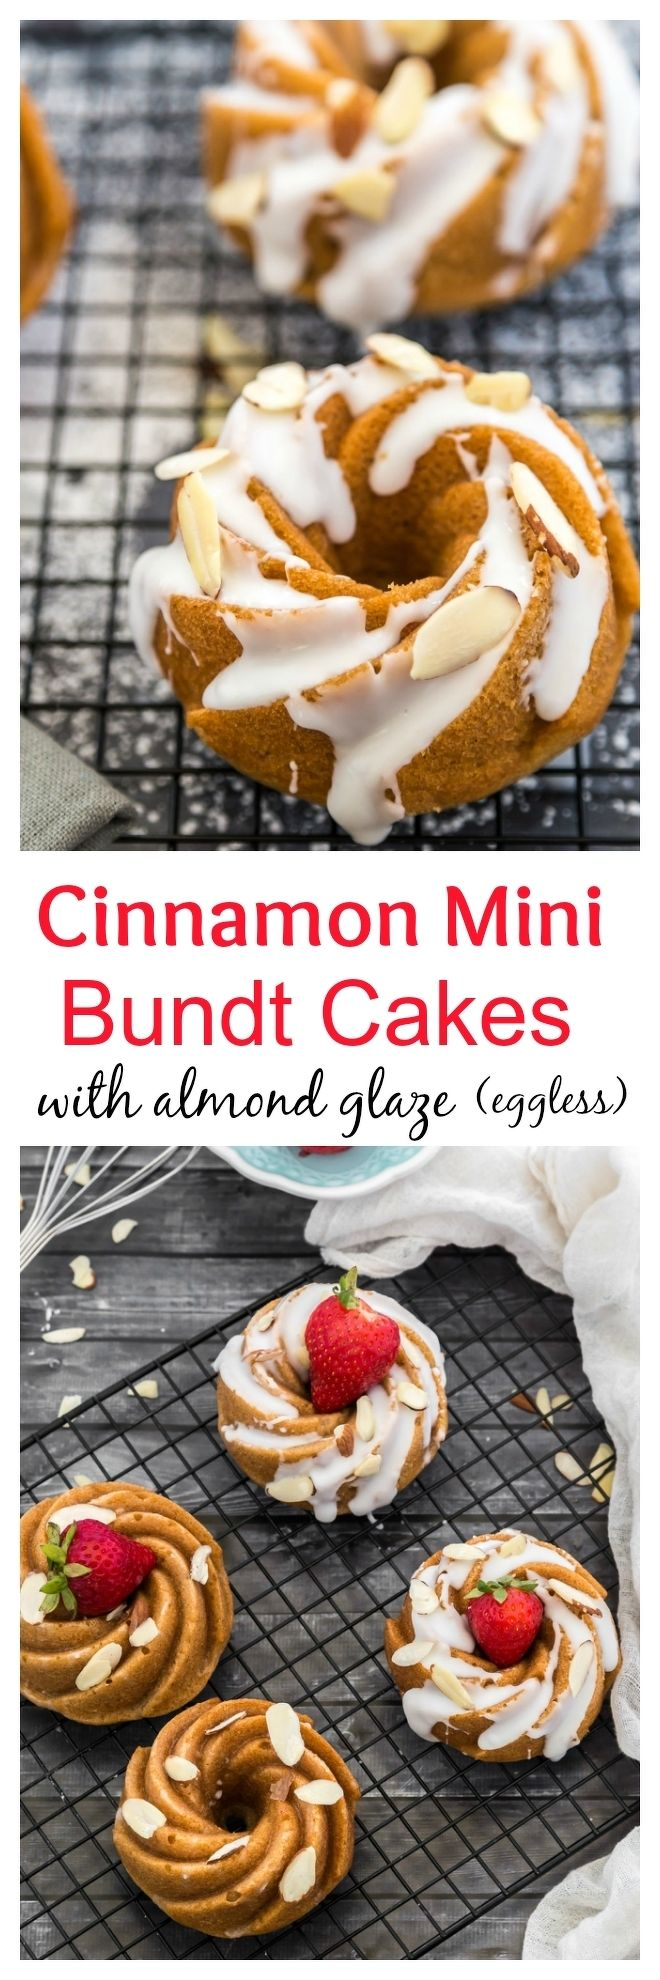 Eggless Cinnamon Mini Bundt Cakes Collage-nocwm